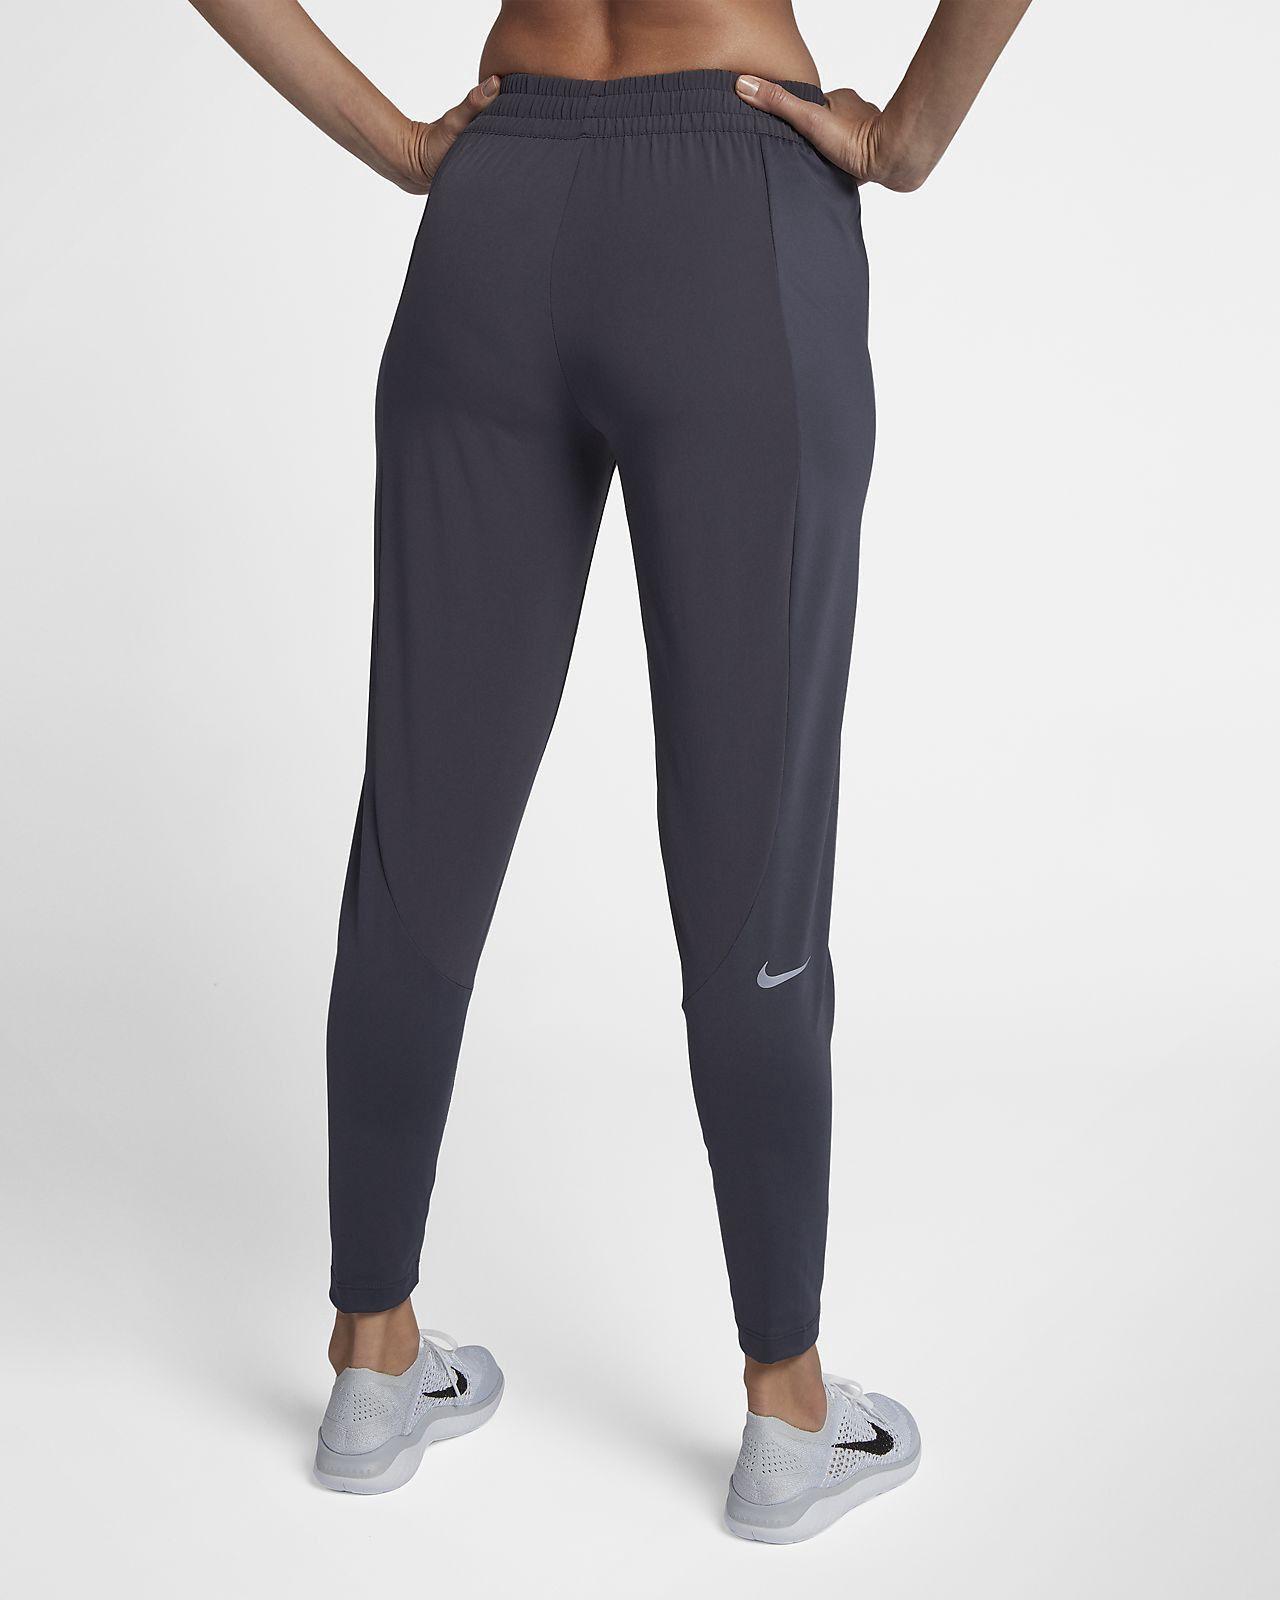 Nike Swift Women s Running Pants - 2Xl (20–22) b99680cbf4f44